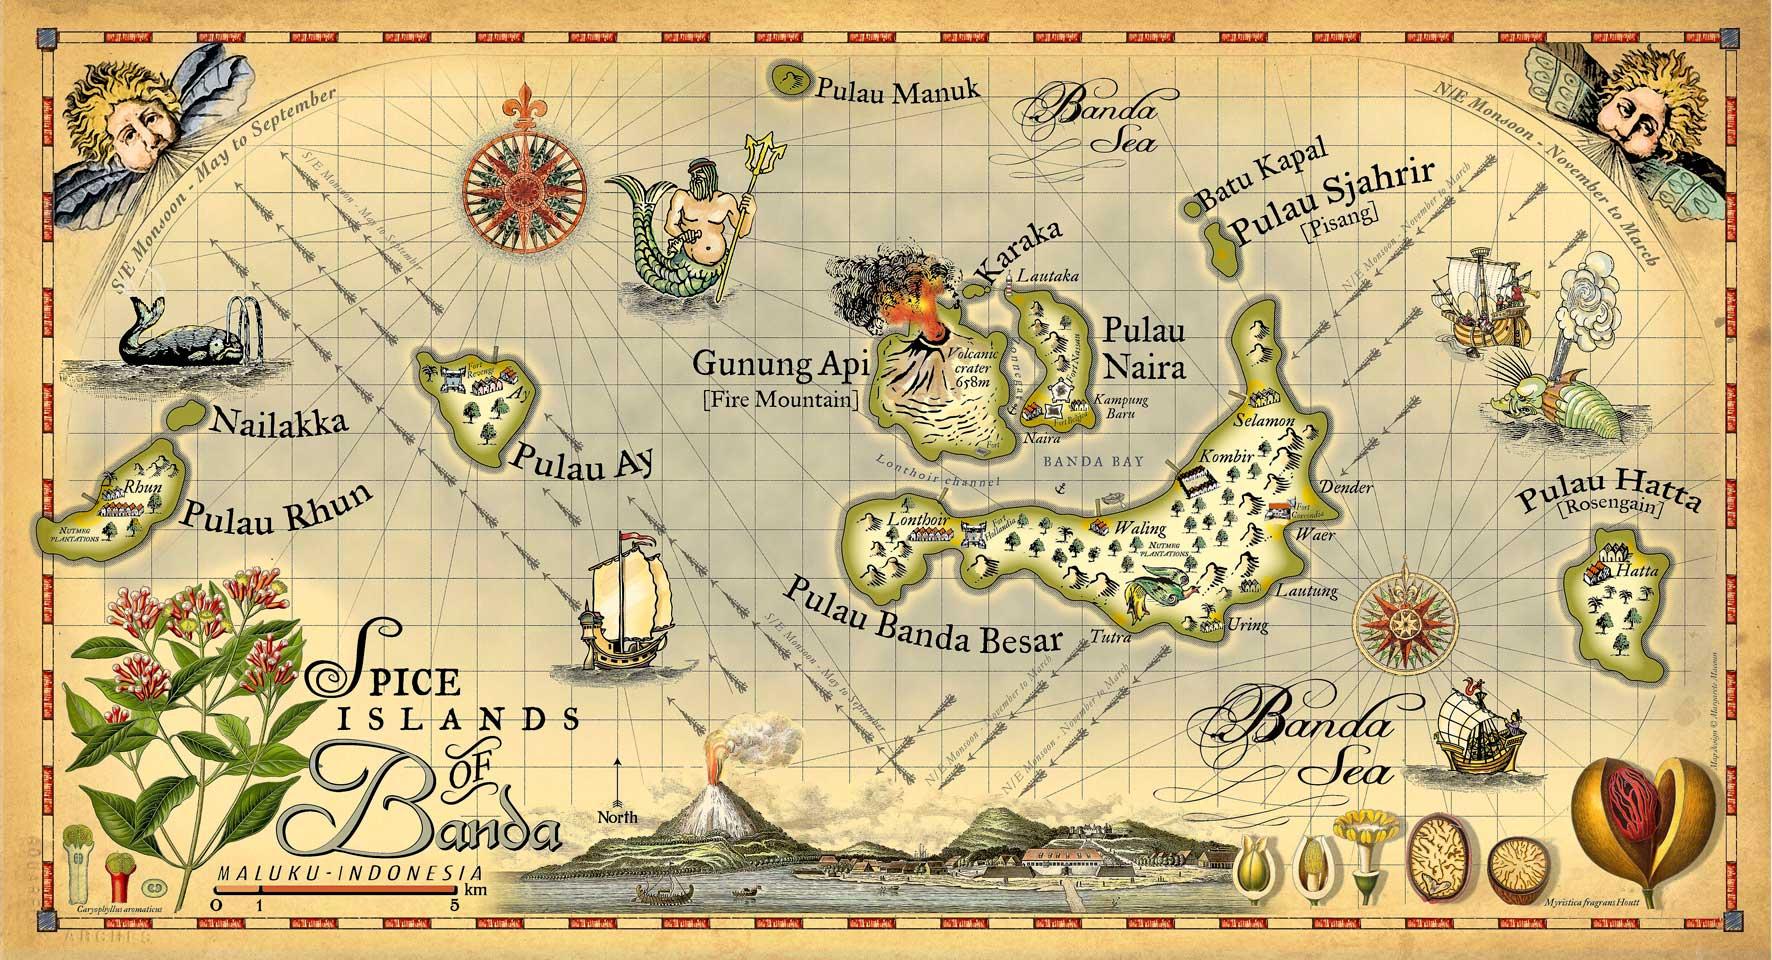 Pulau Banda | cilubintang.com